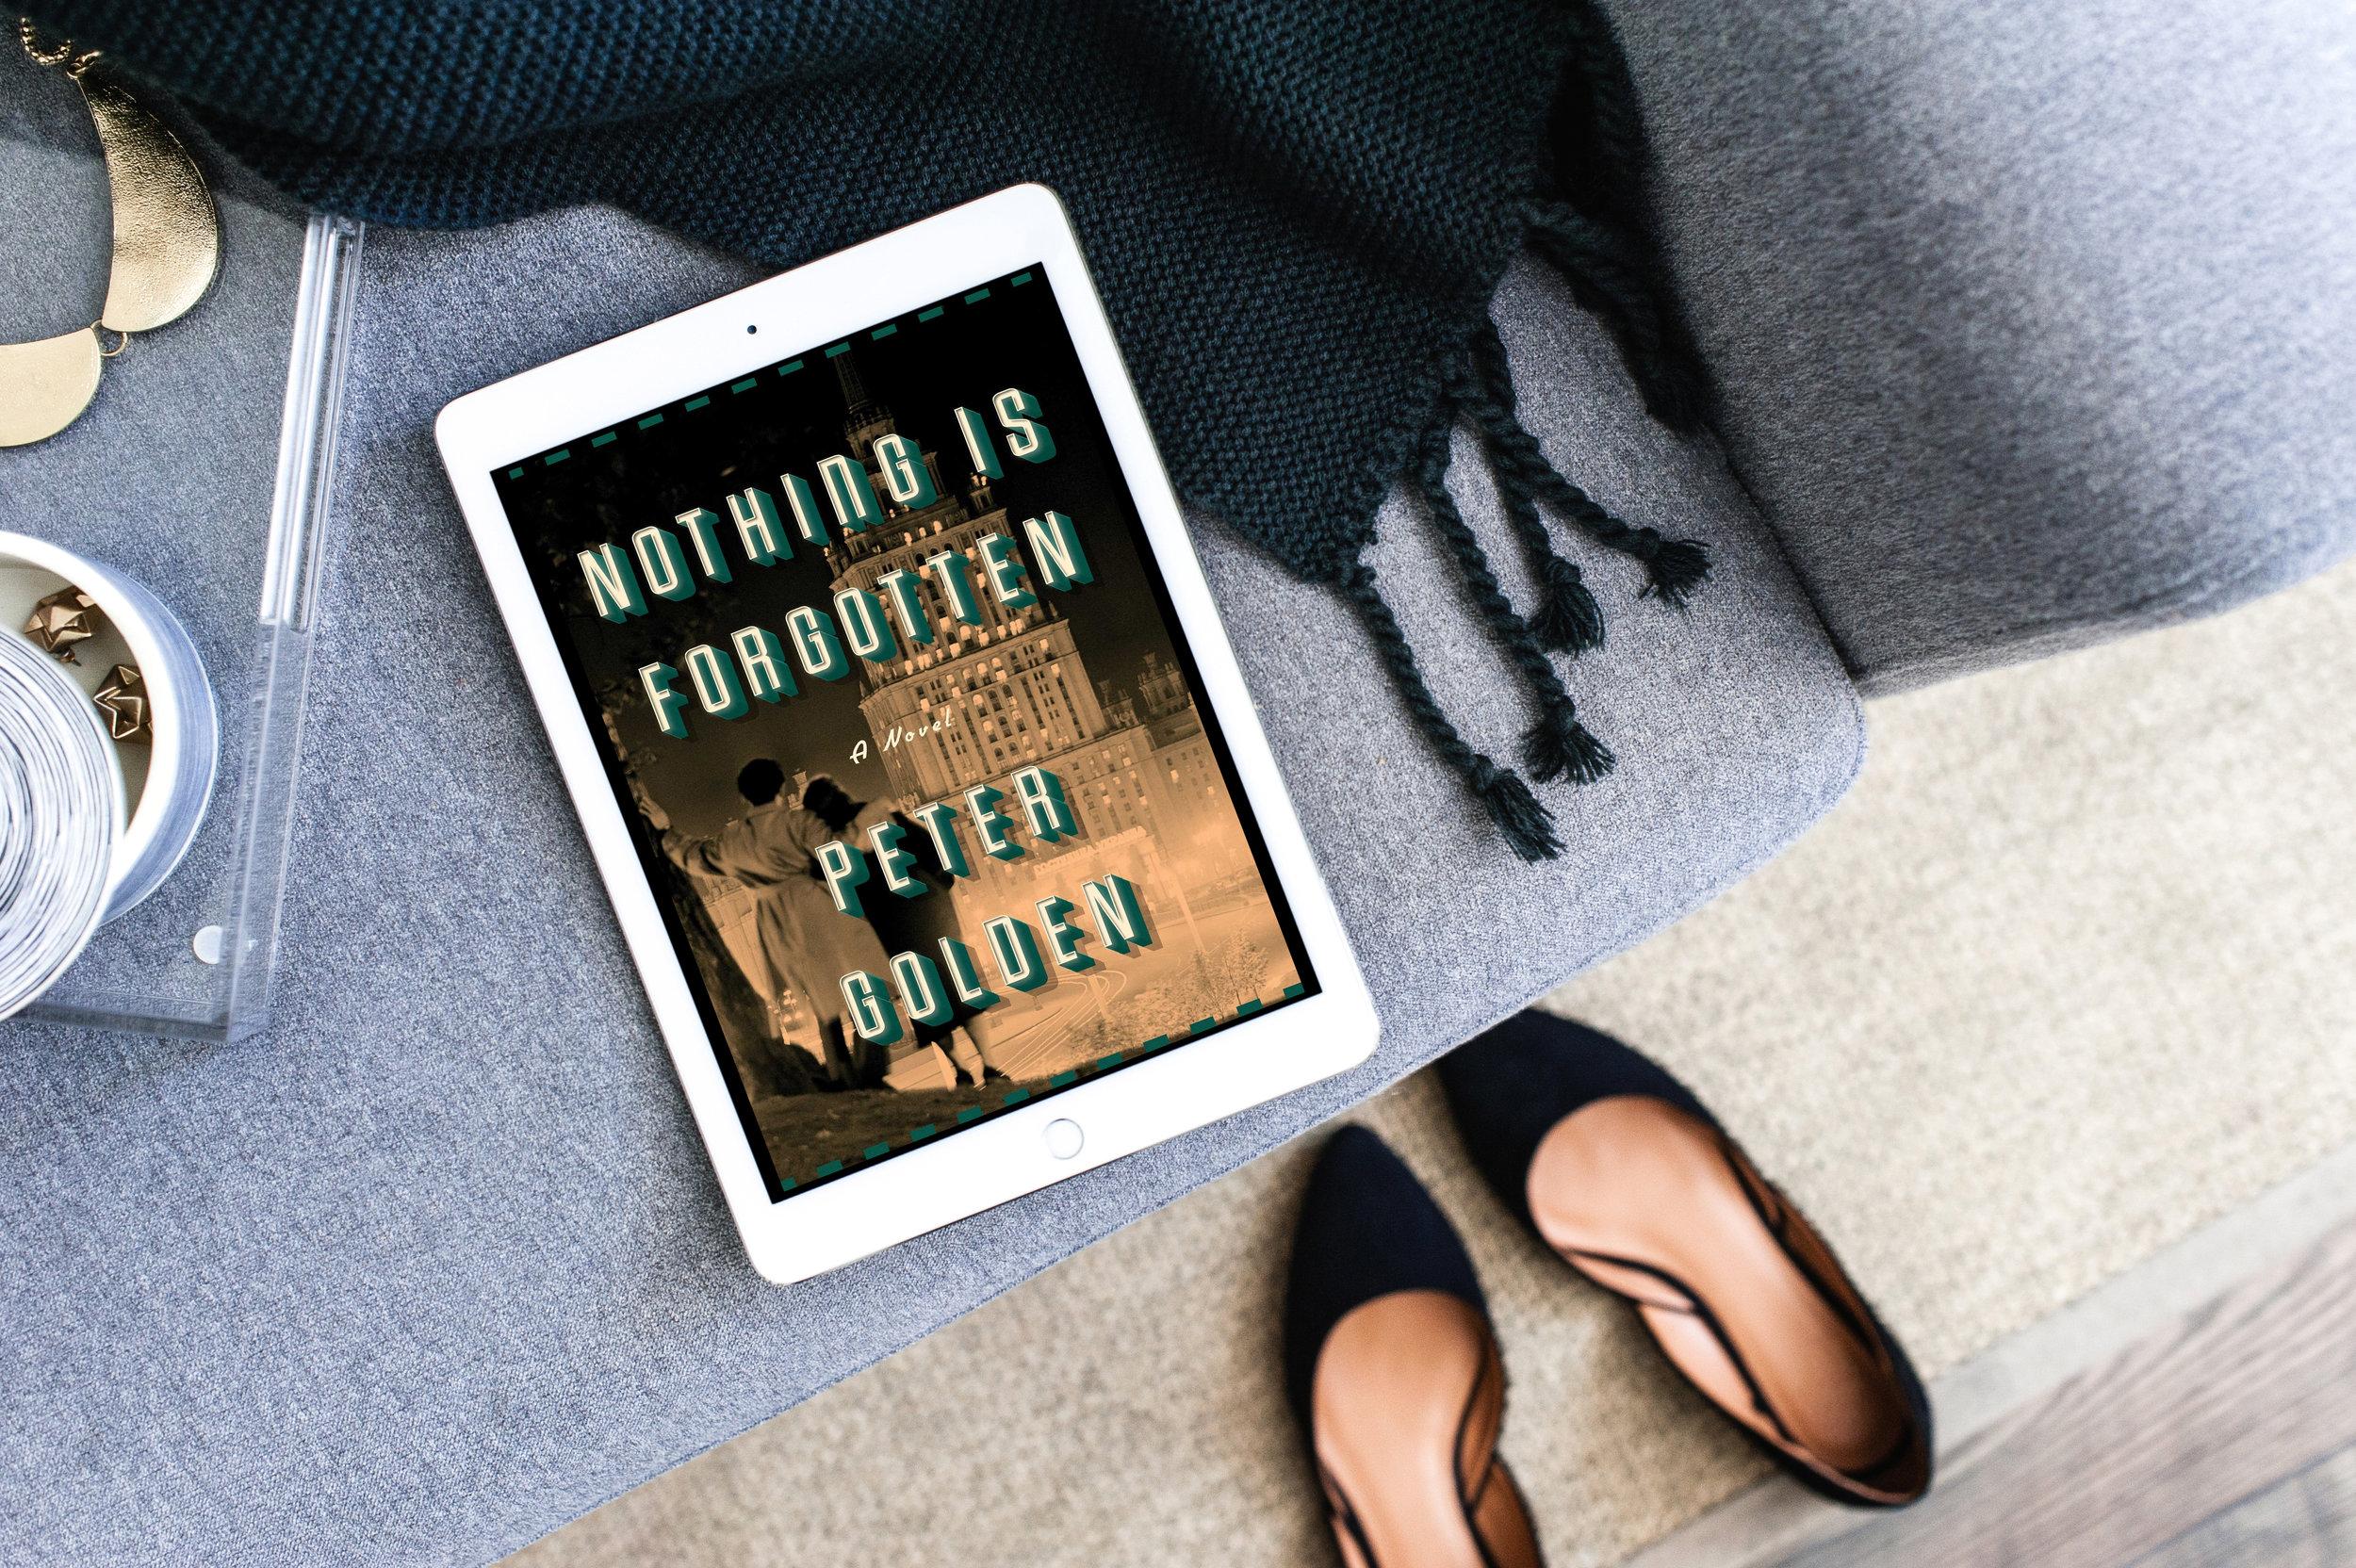 Nothing is forgotten peter golden book review